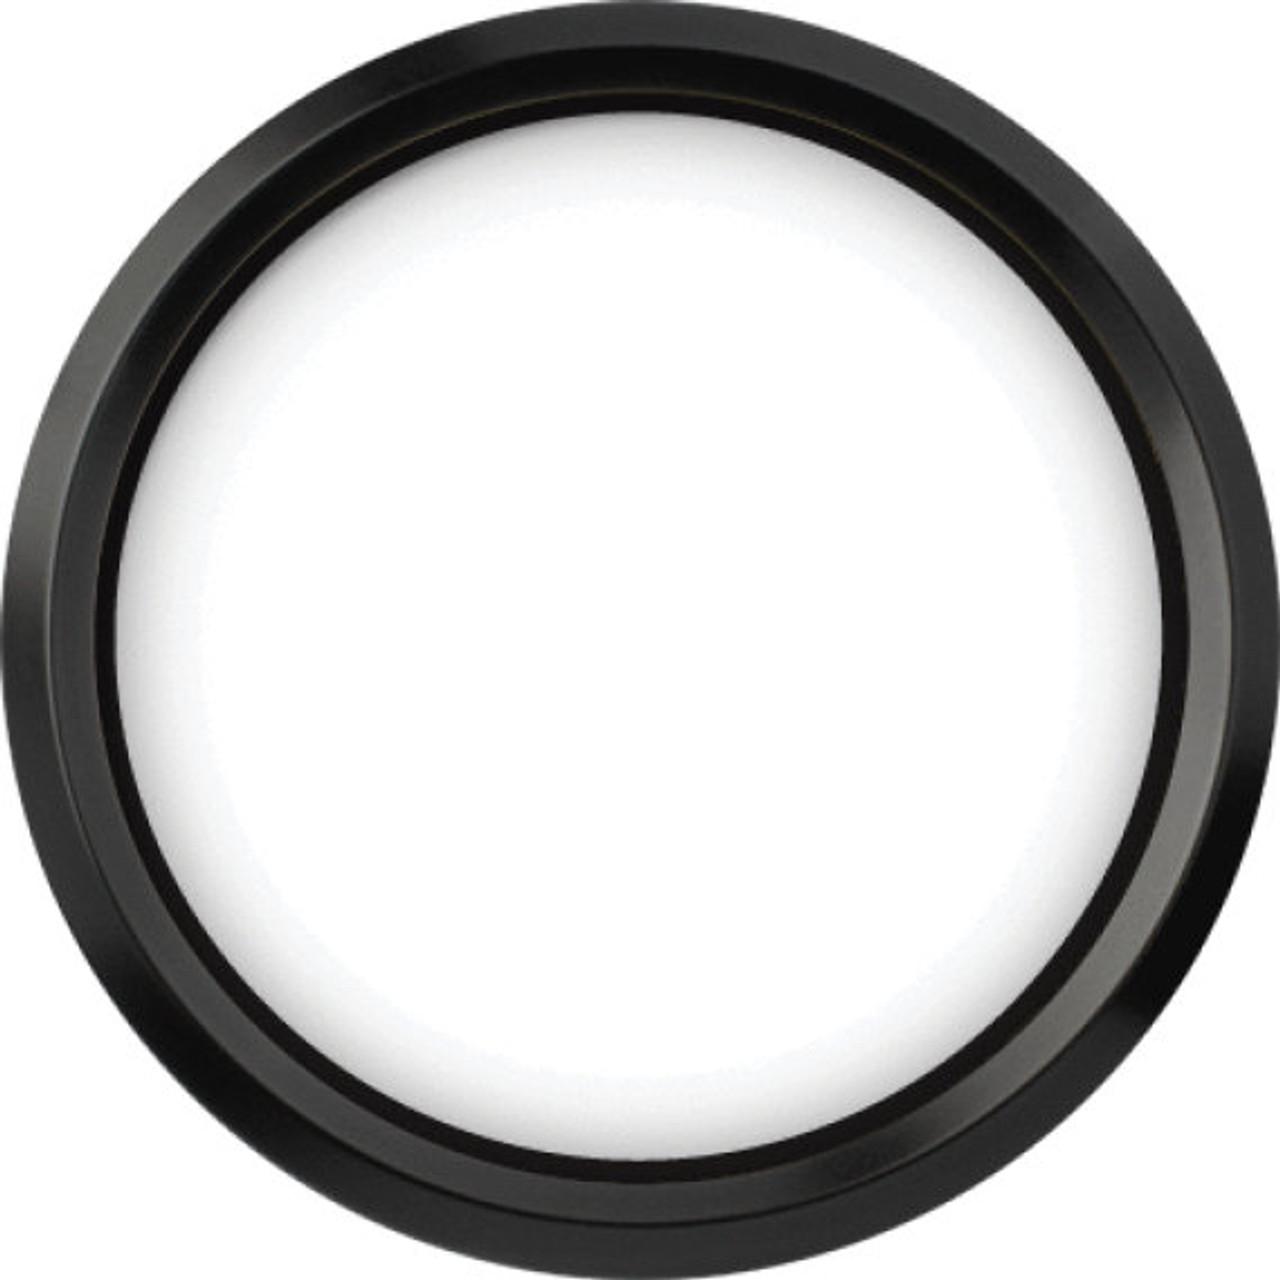 "Stealth Black Replacement Bezel for 4-1/2"" gauge"